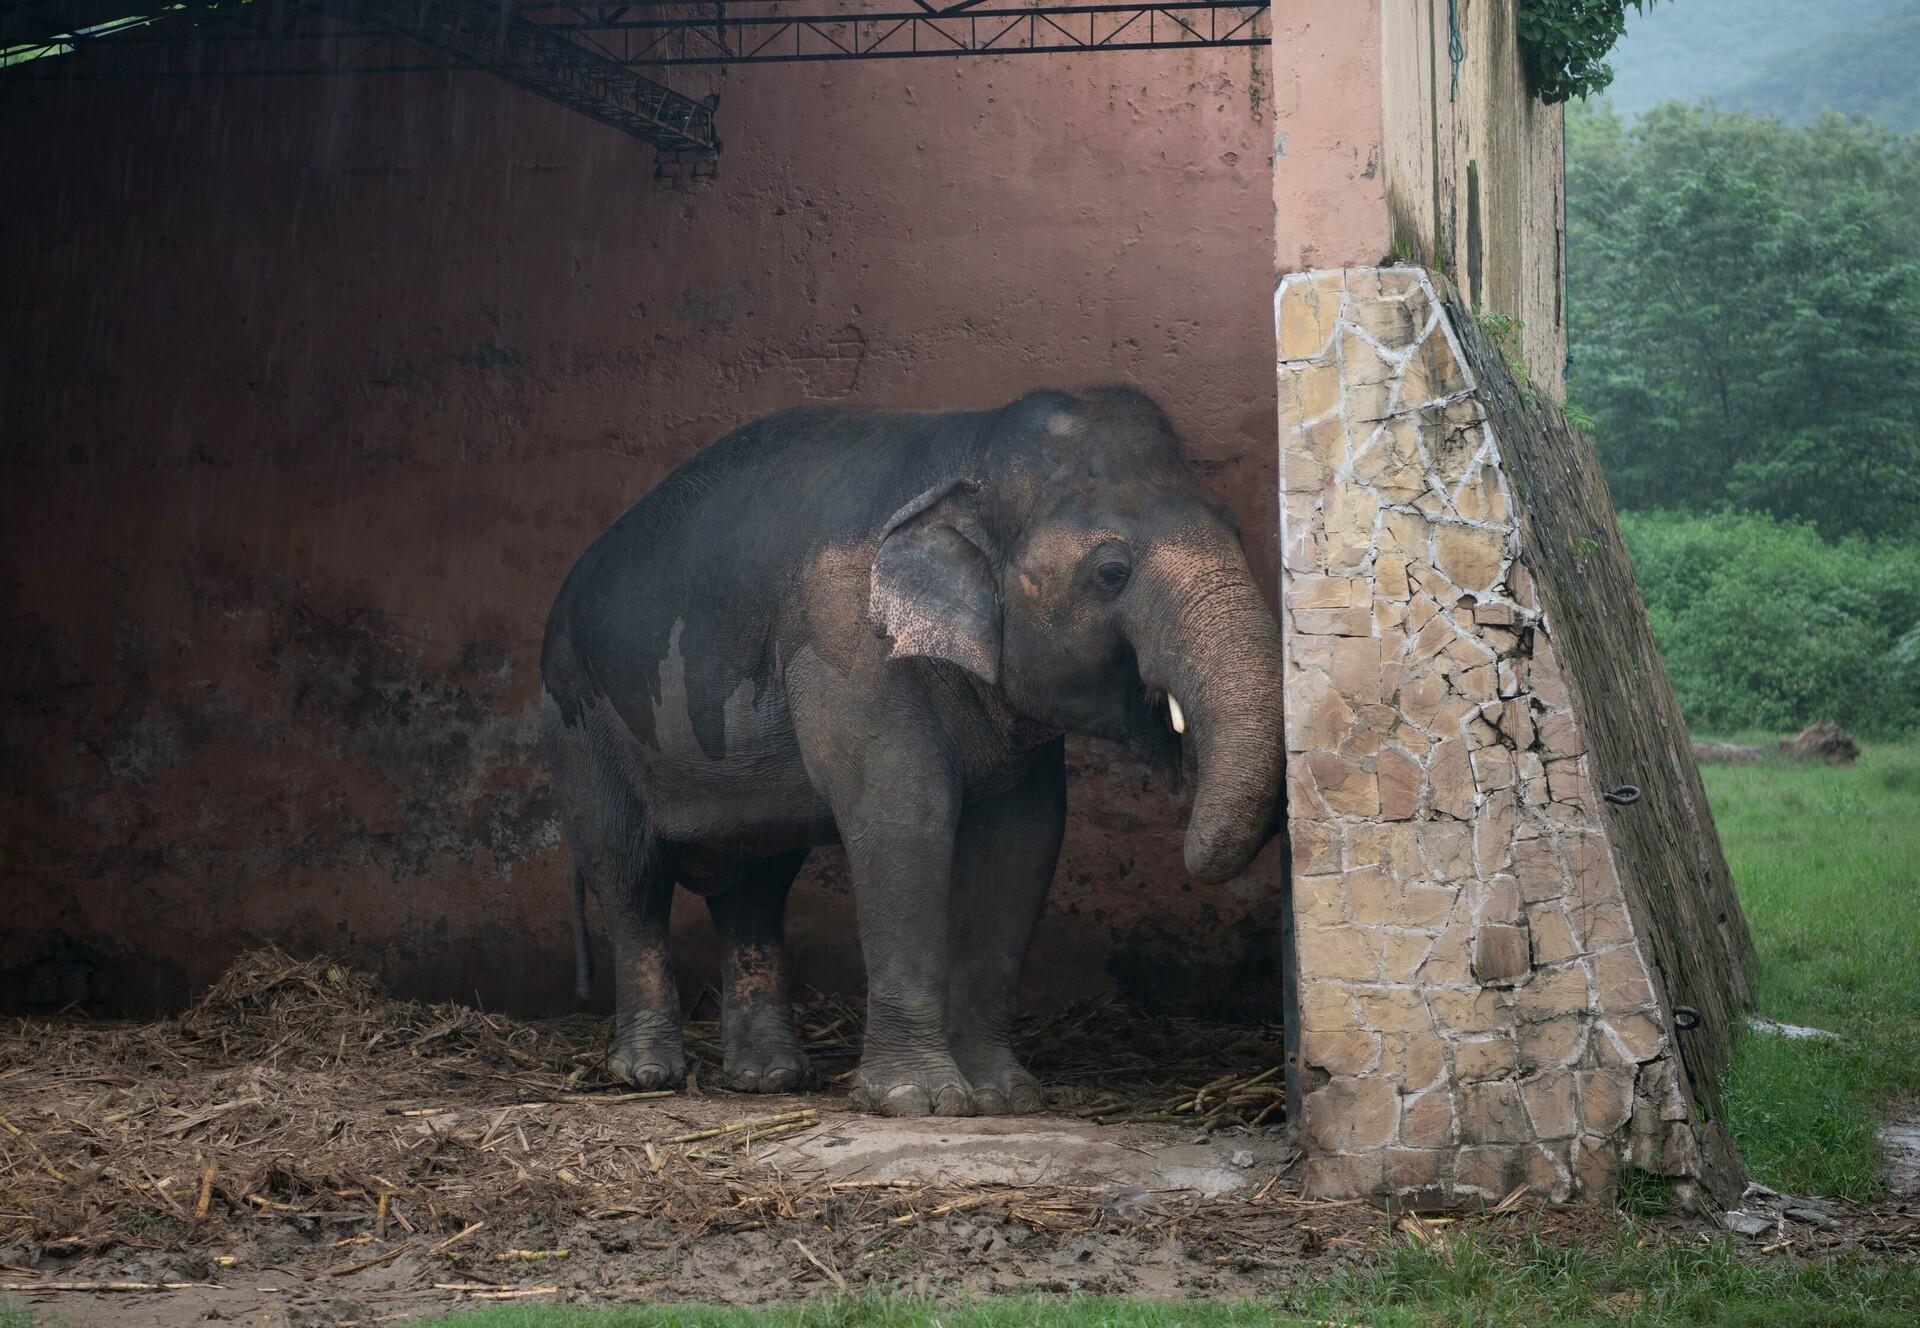 Elephant Kaavan will soon leave Pakistan